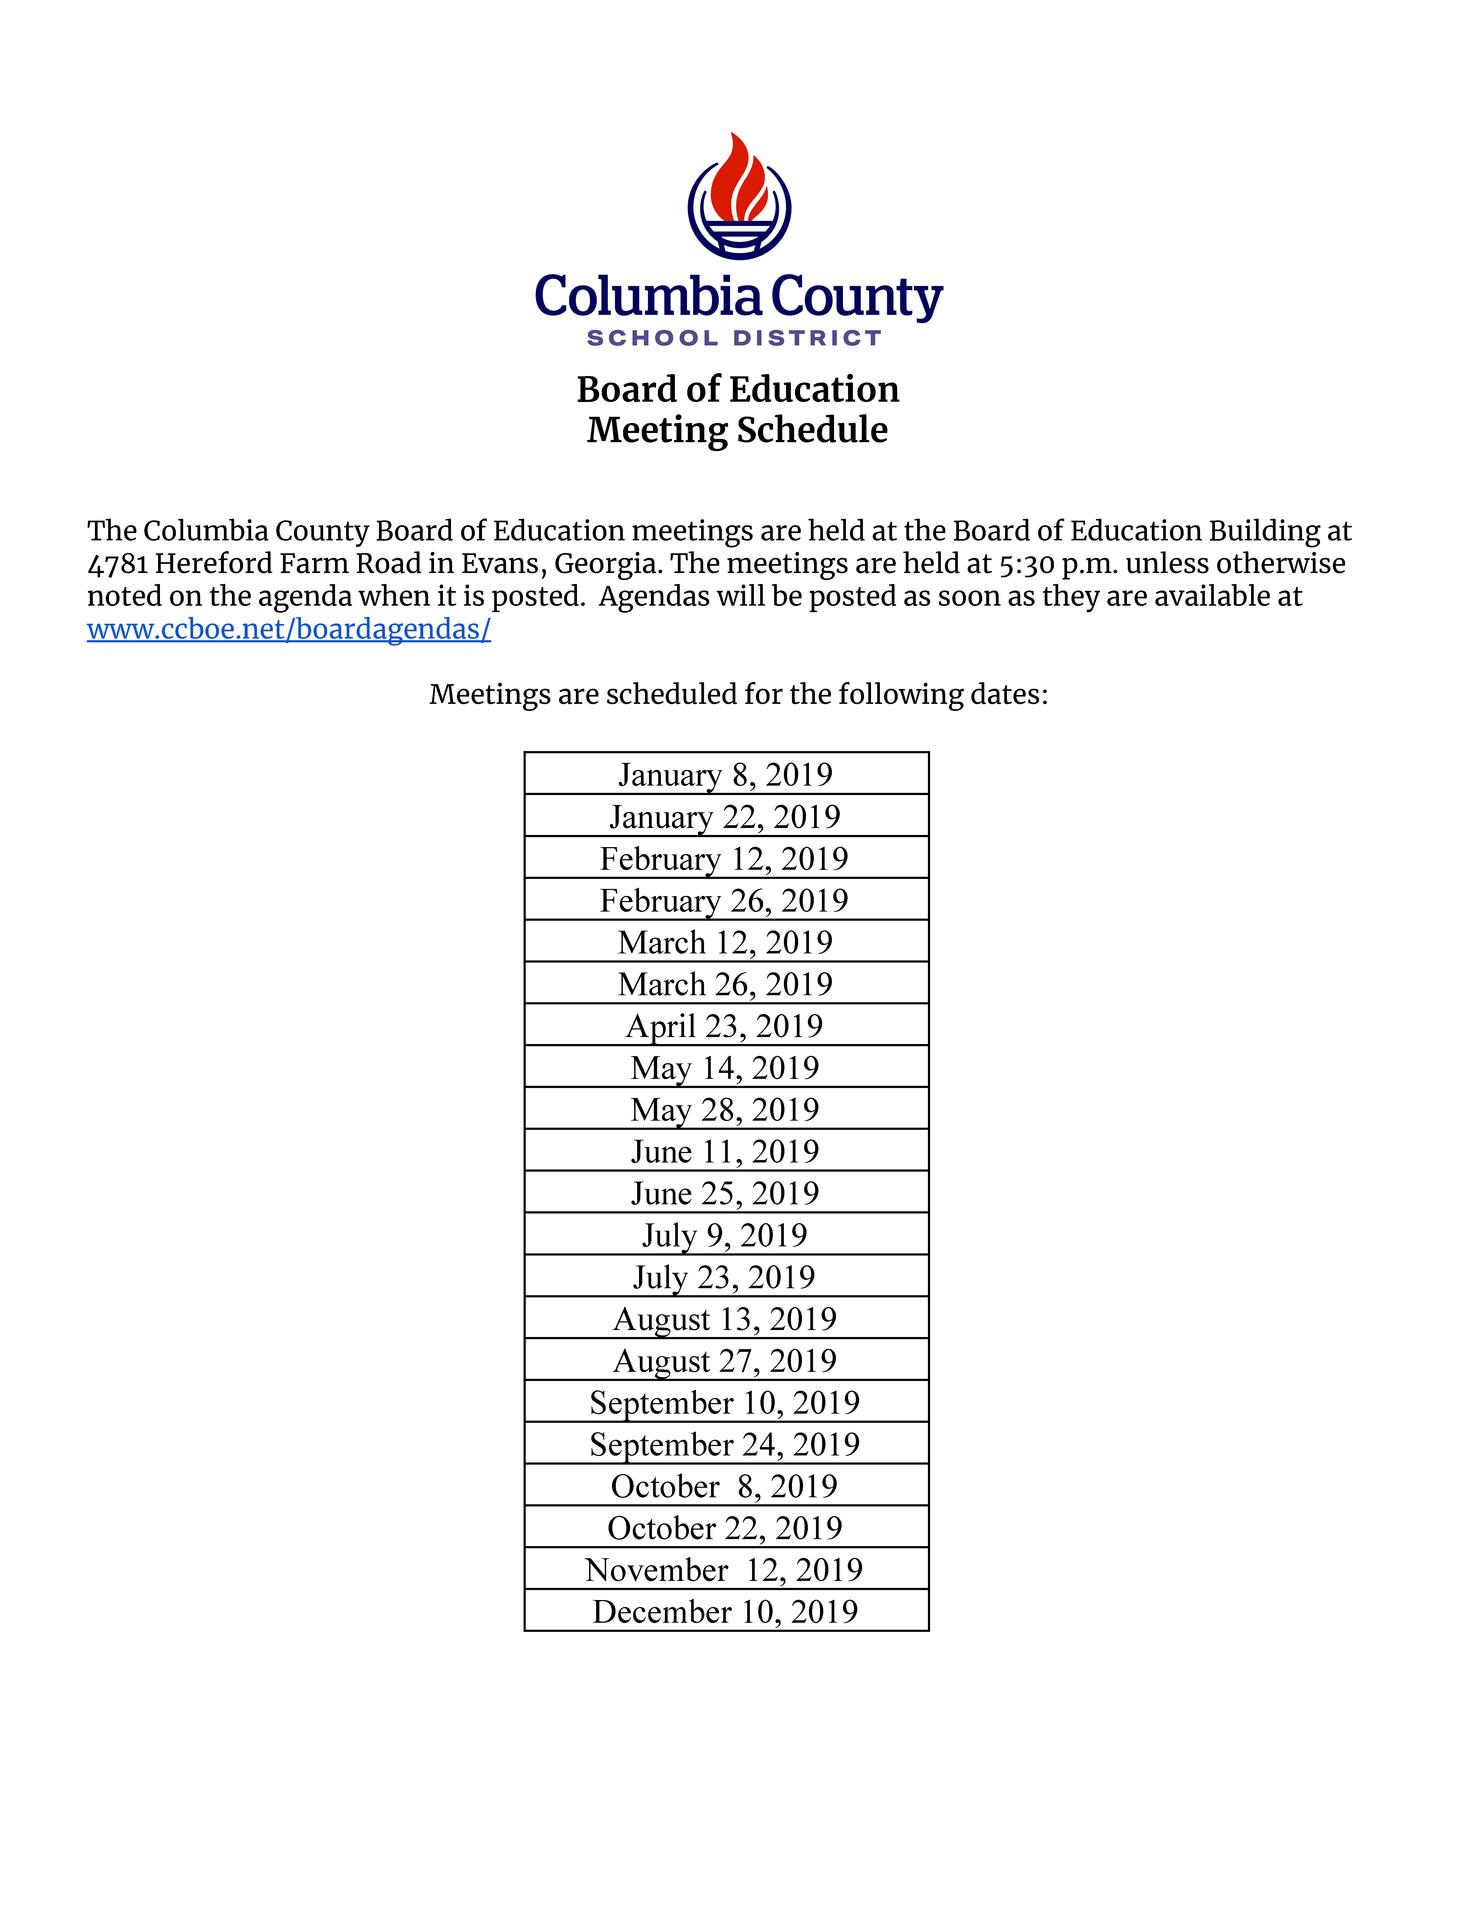 BOE meeting schedule list